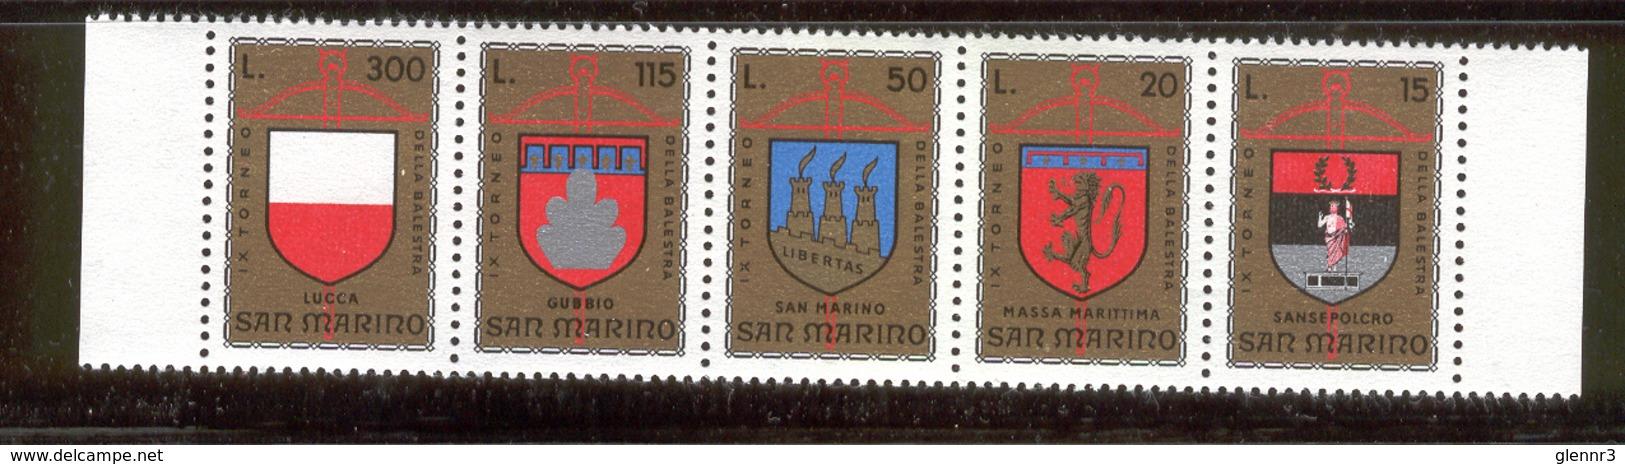 SAN MARINO 1974 Crossbow Tournament, Coats Of Arms Scott Cat. No(s). 847a MNH Strip Of 5 - San Marino